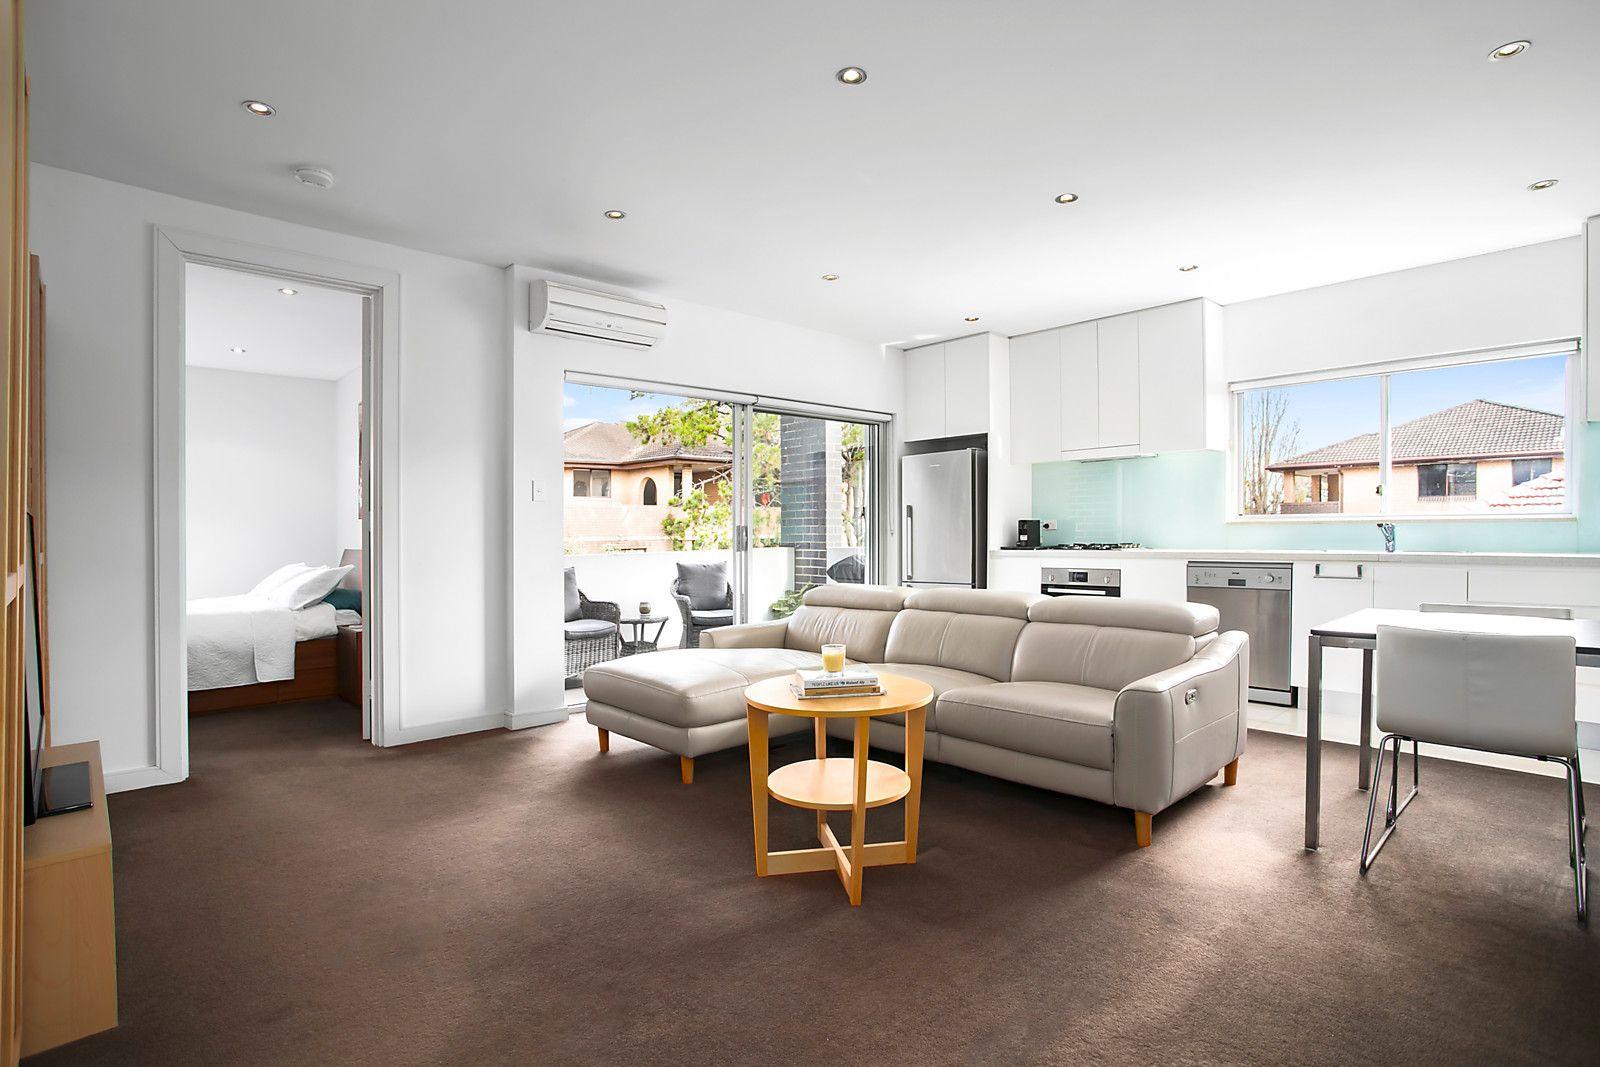 1 bedrooms Apartment / Unit / Flat in 17/10-14 Duke Street KENSINGTON NSW, 2033